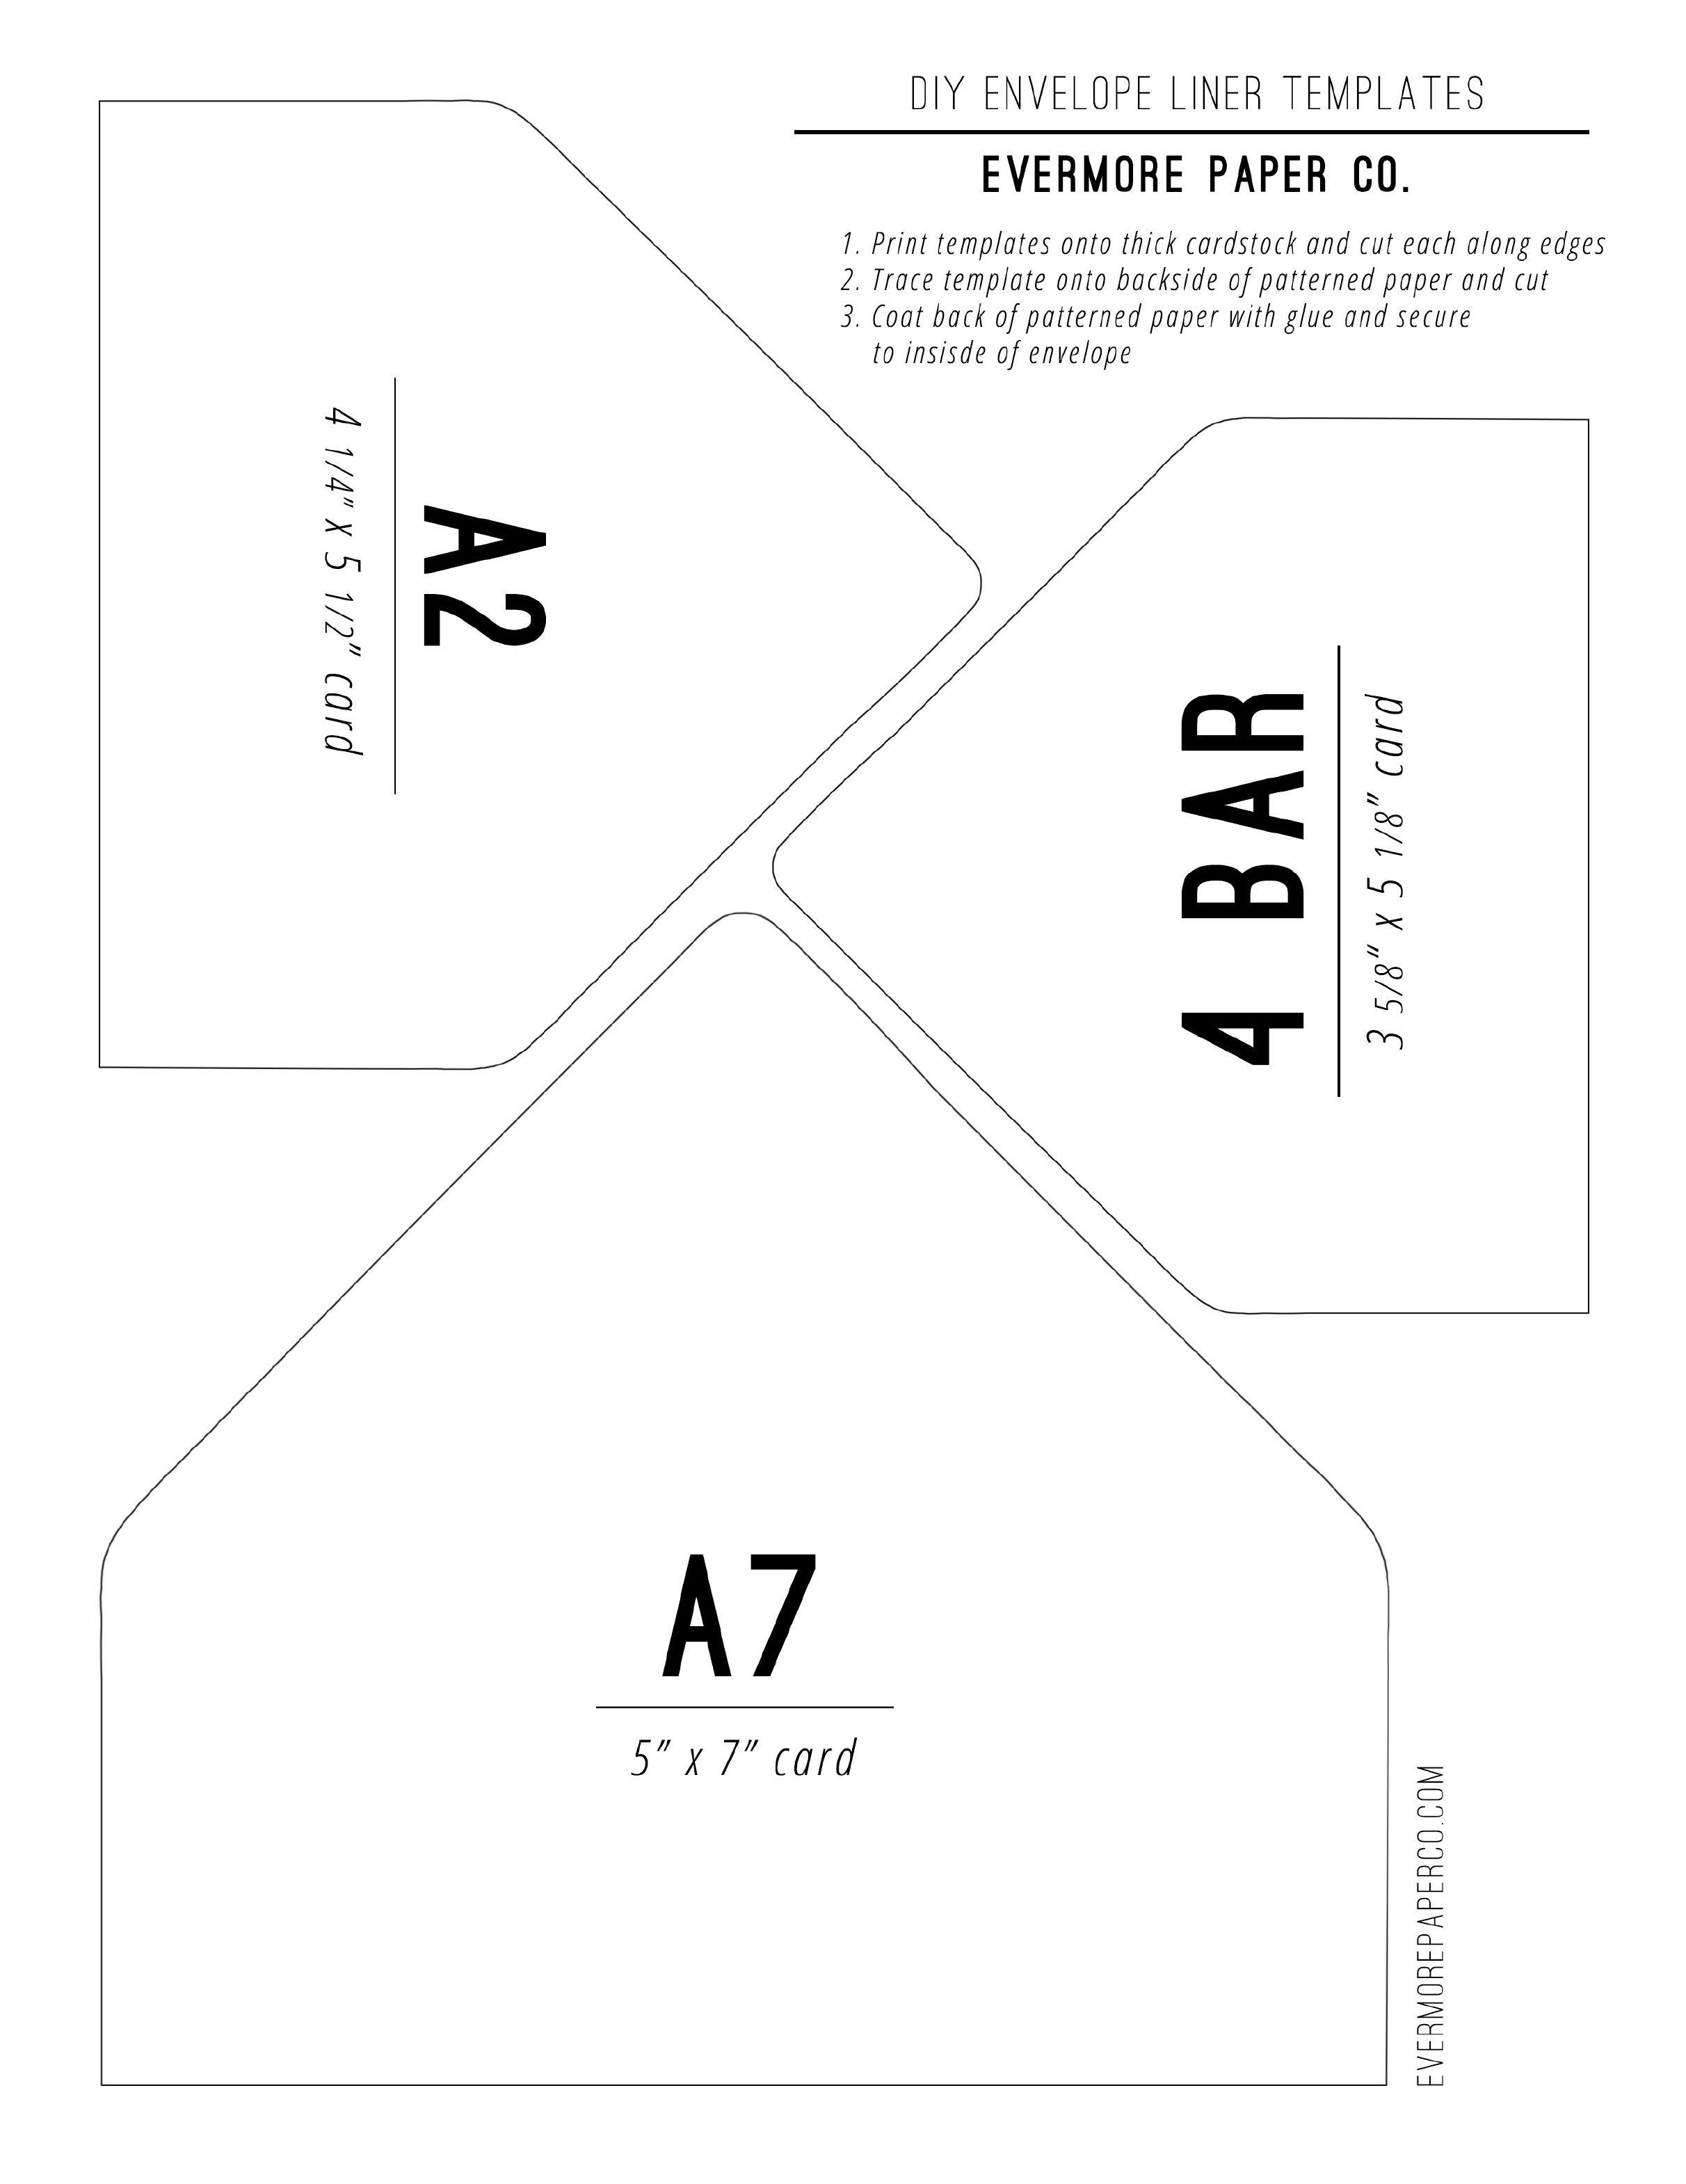 007 Astounding A7 Envelope Liner Template Image  Printable Illustrator FreeFull